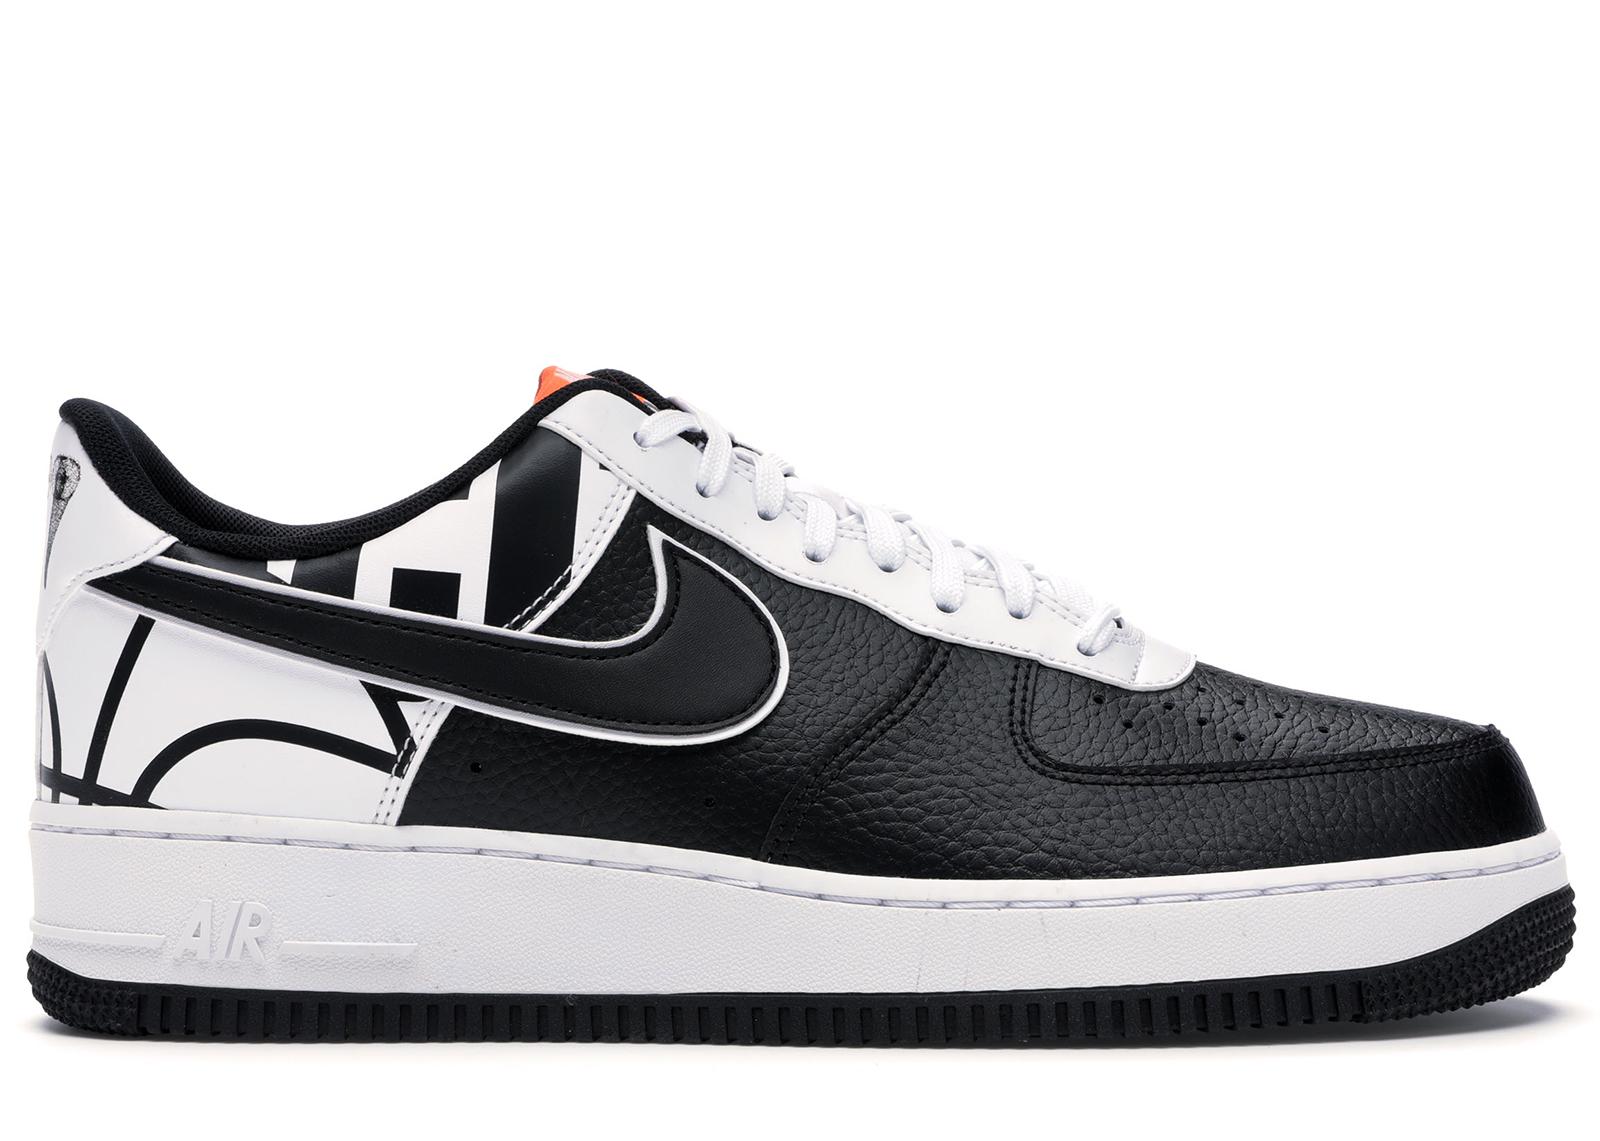 Nike Air Force 1 07 LV8 Black Black-White - 823511-011